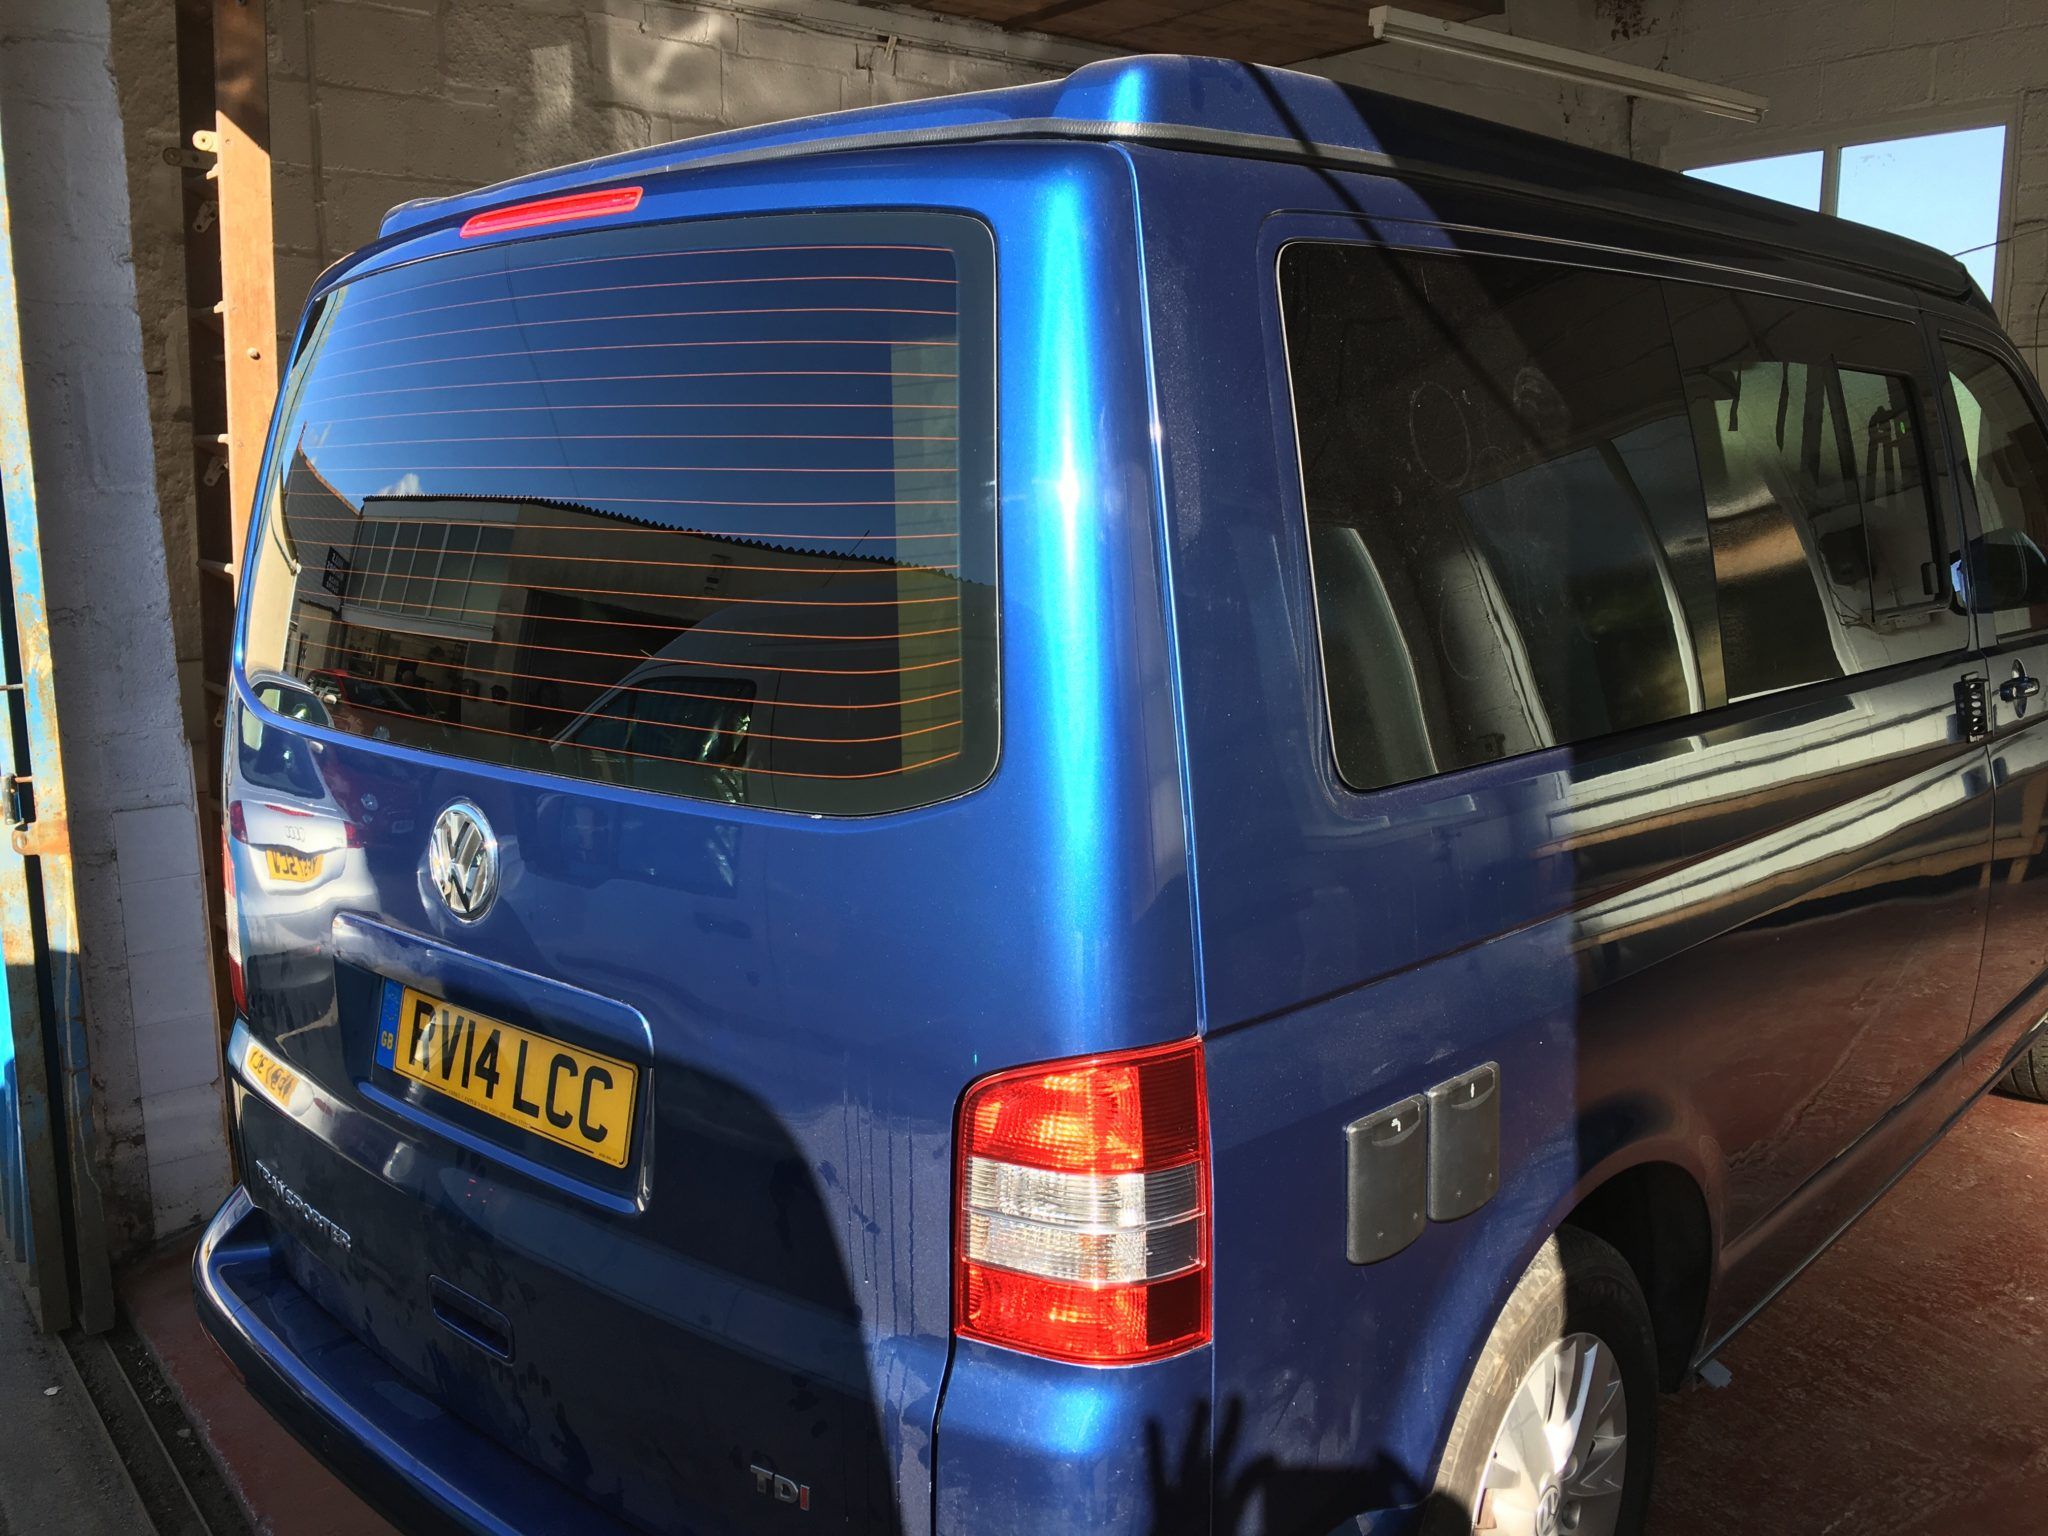 VW Caravelle Rear Window Tint